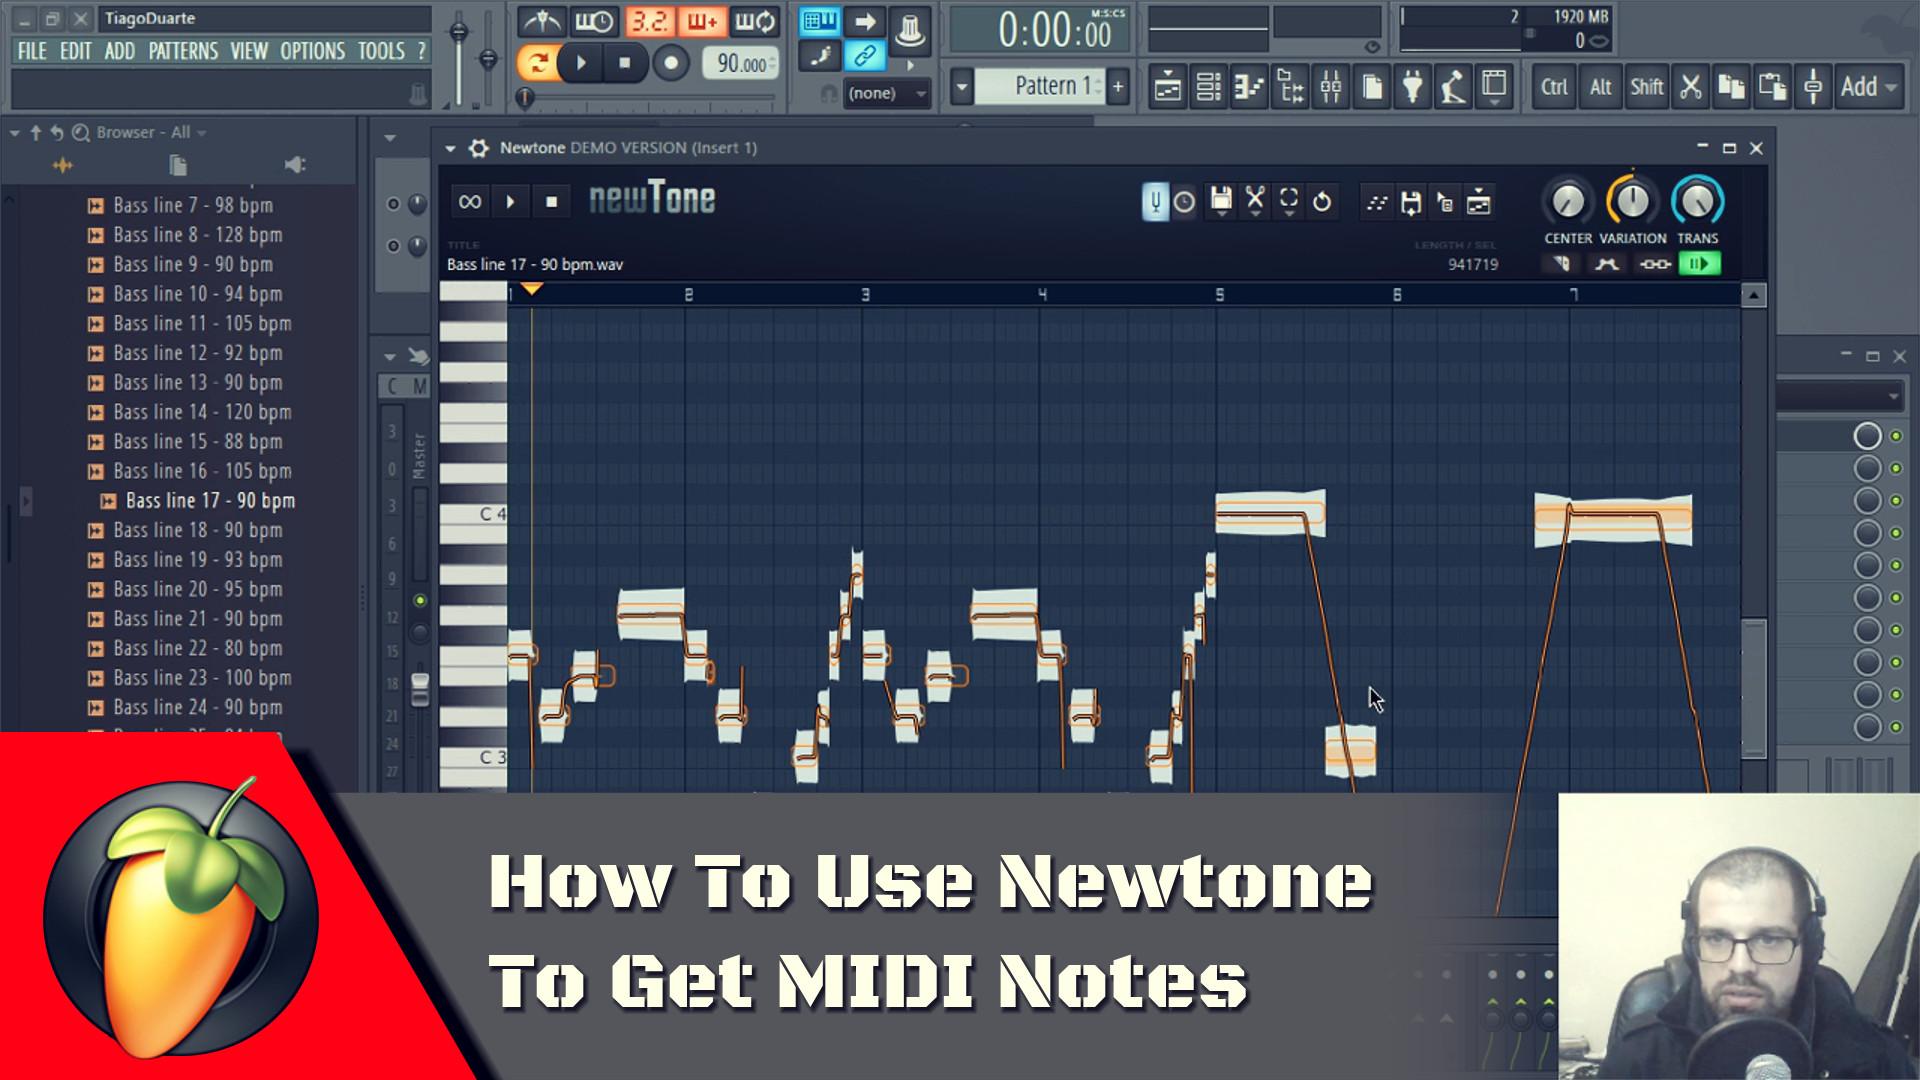 Newtone To Get MIDI Notes